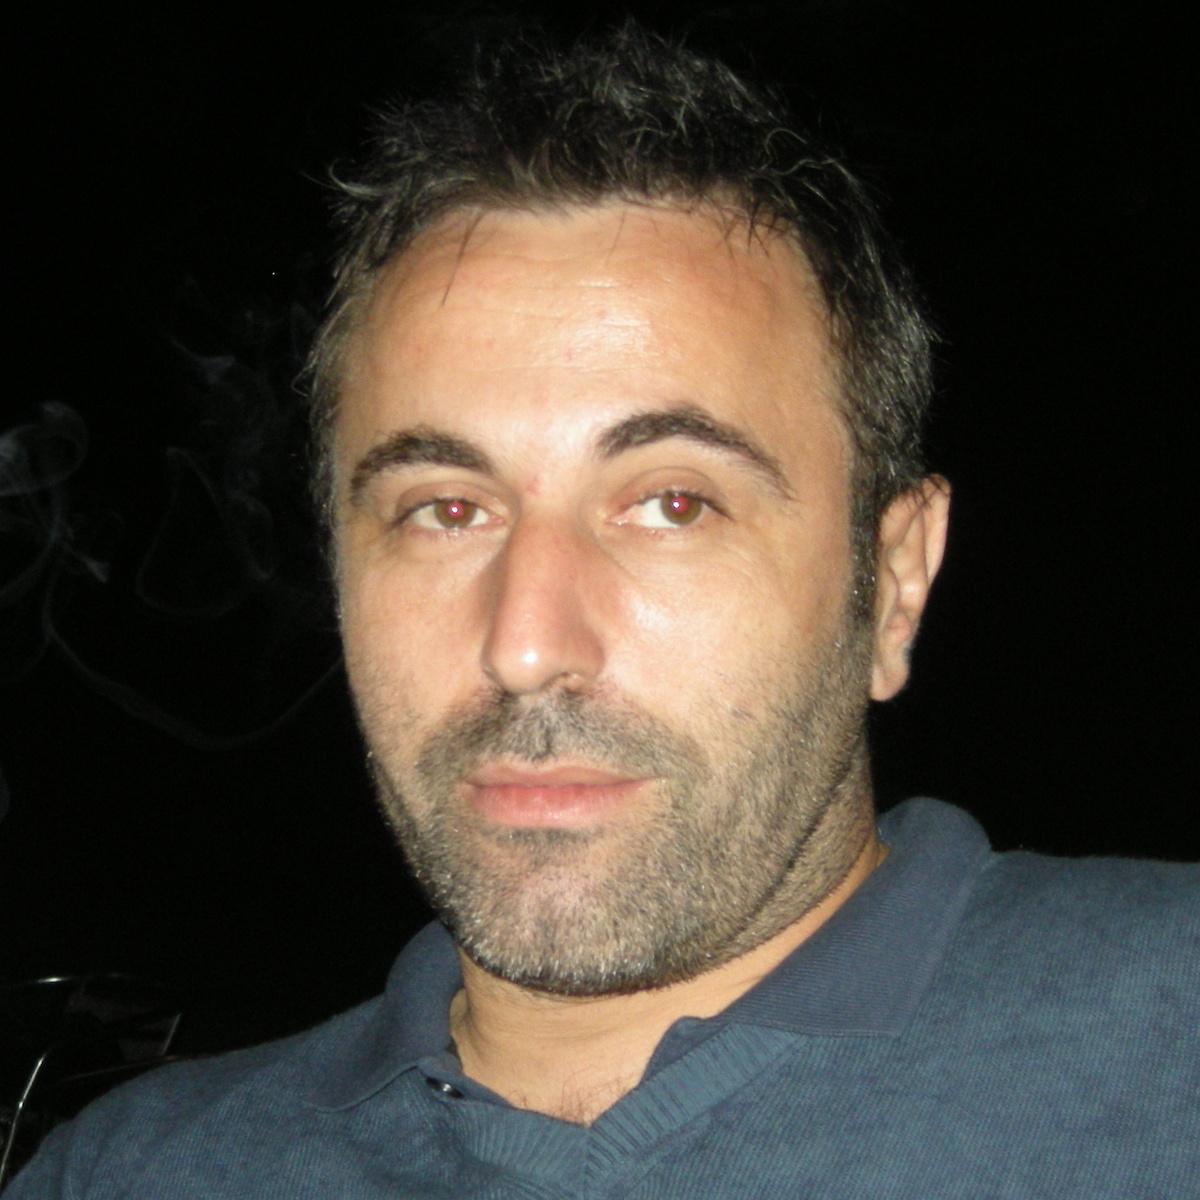 Luigi Romolo Carrino